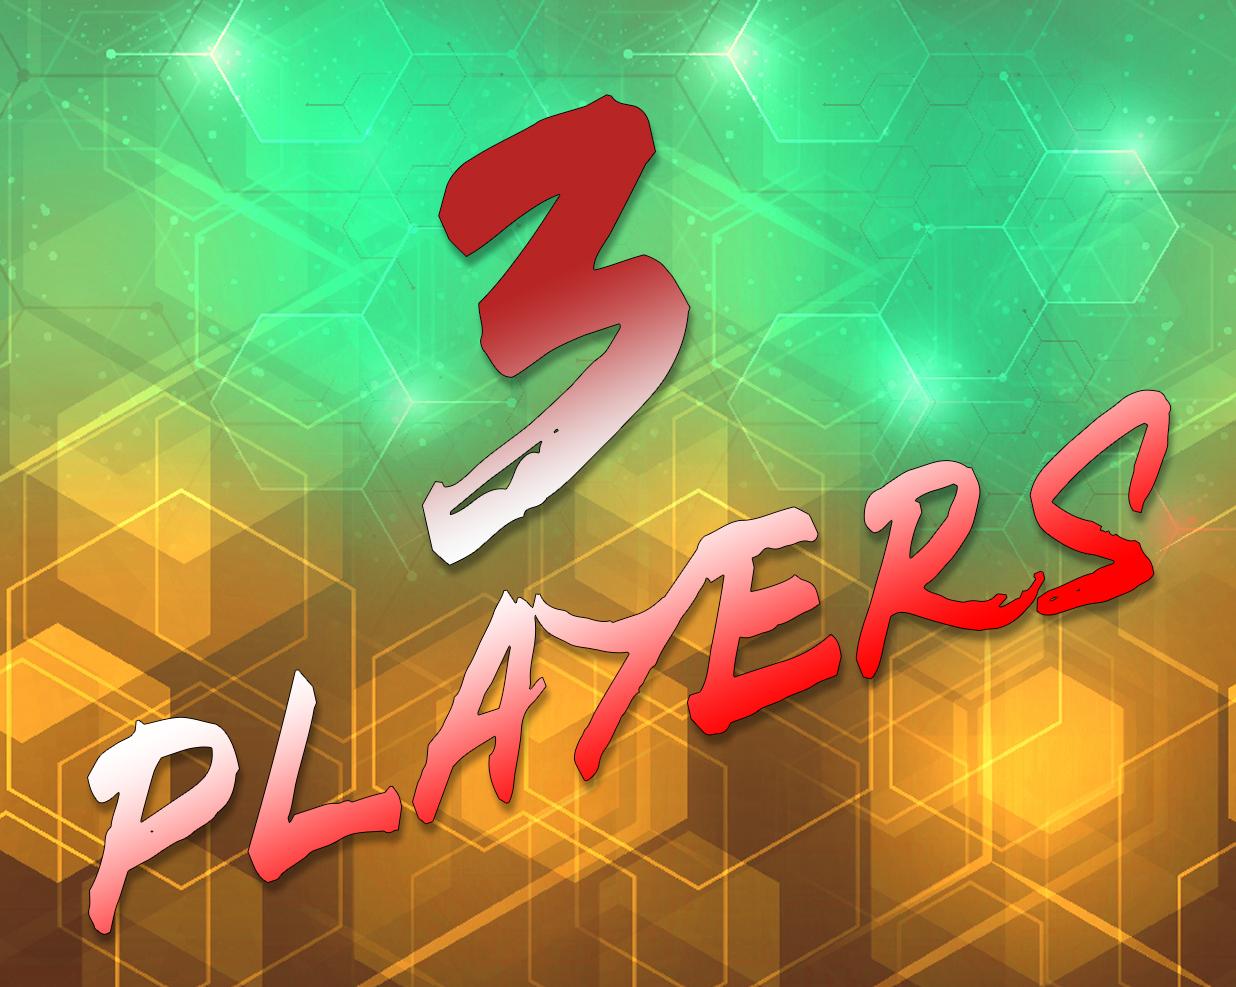 3playersfreeroam 1